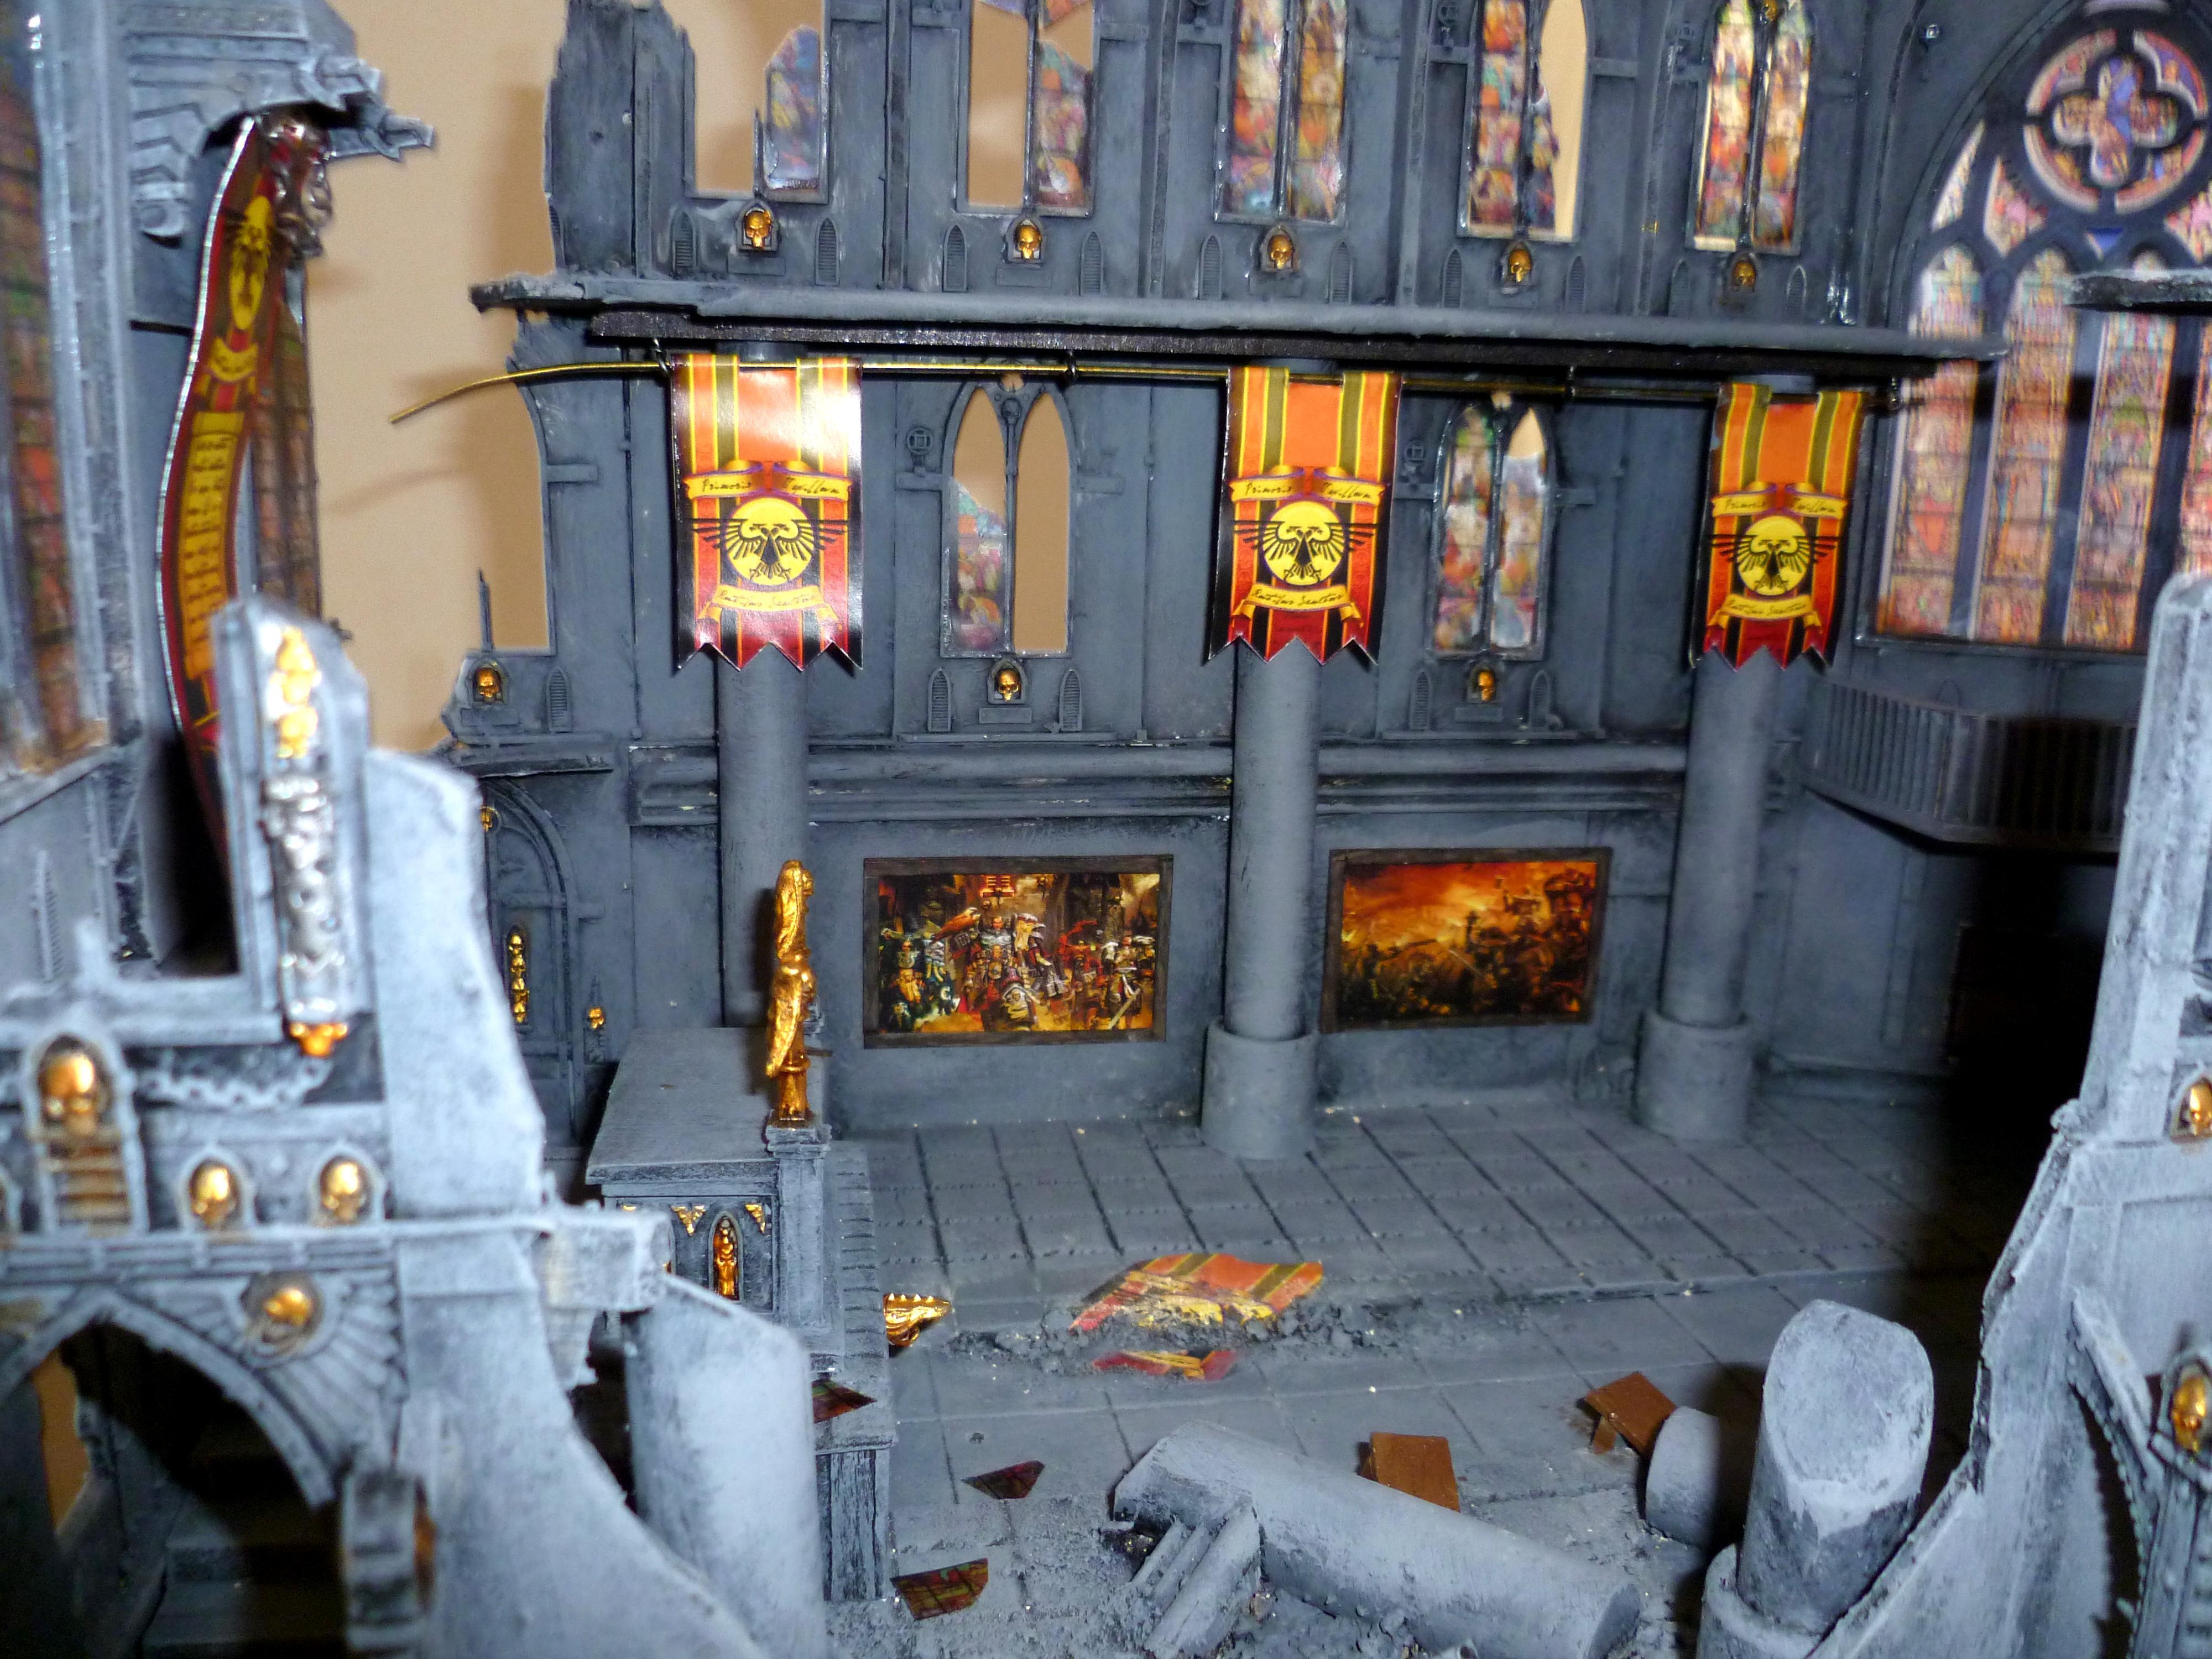 Cathedral, Terrain, Warhammer 40,000